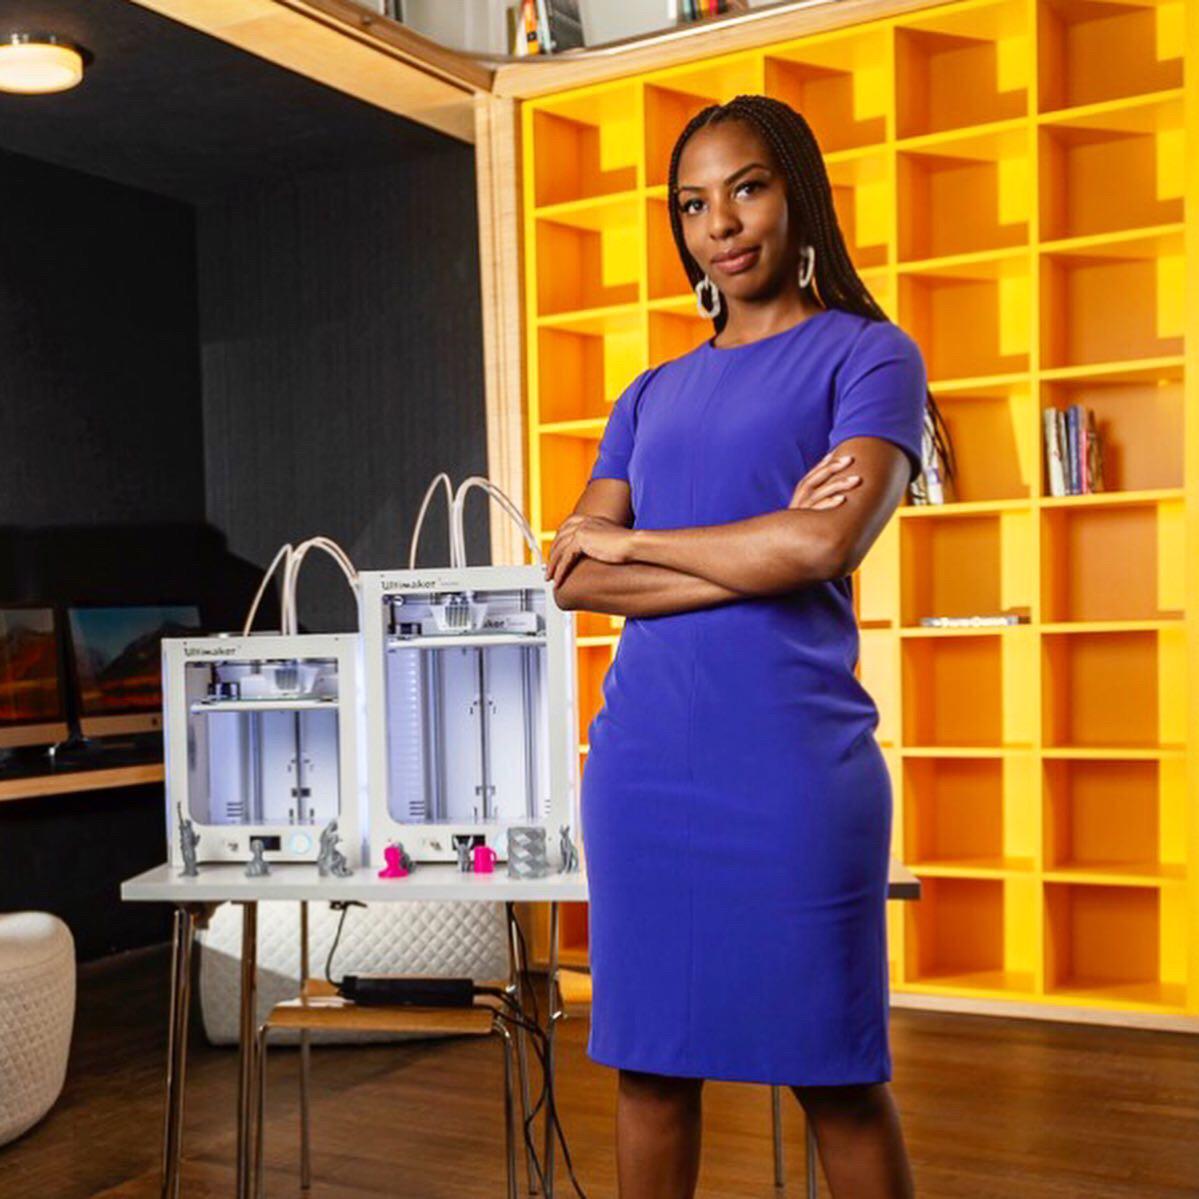 Women in 3D printing - Chloe Taylor